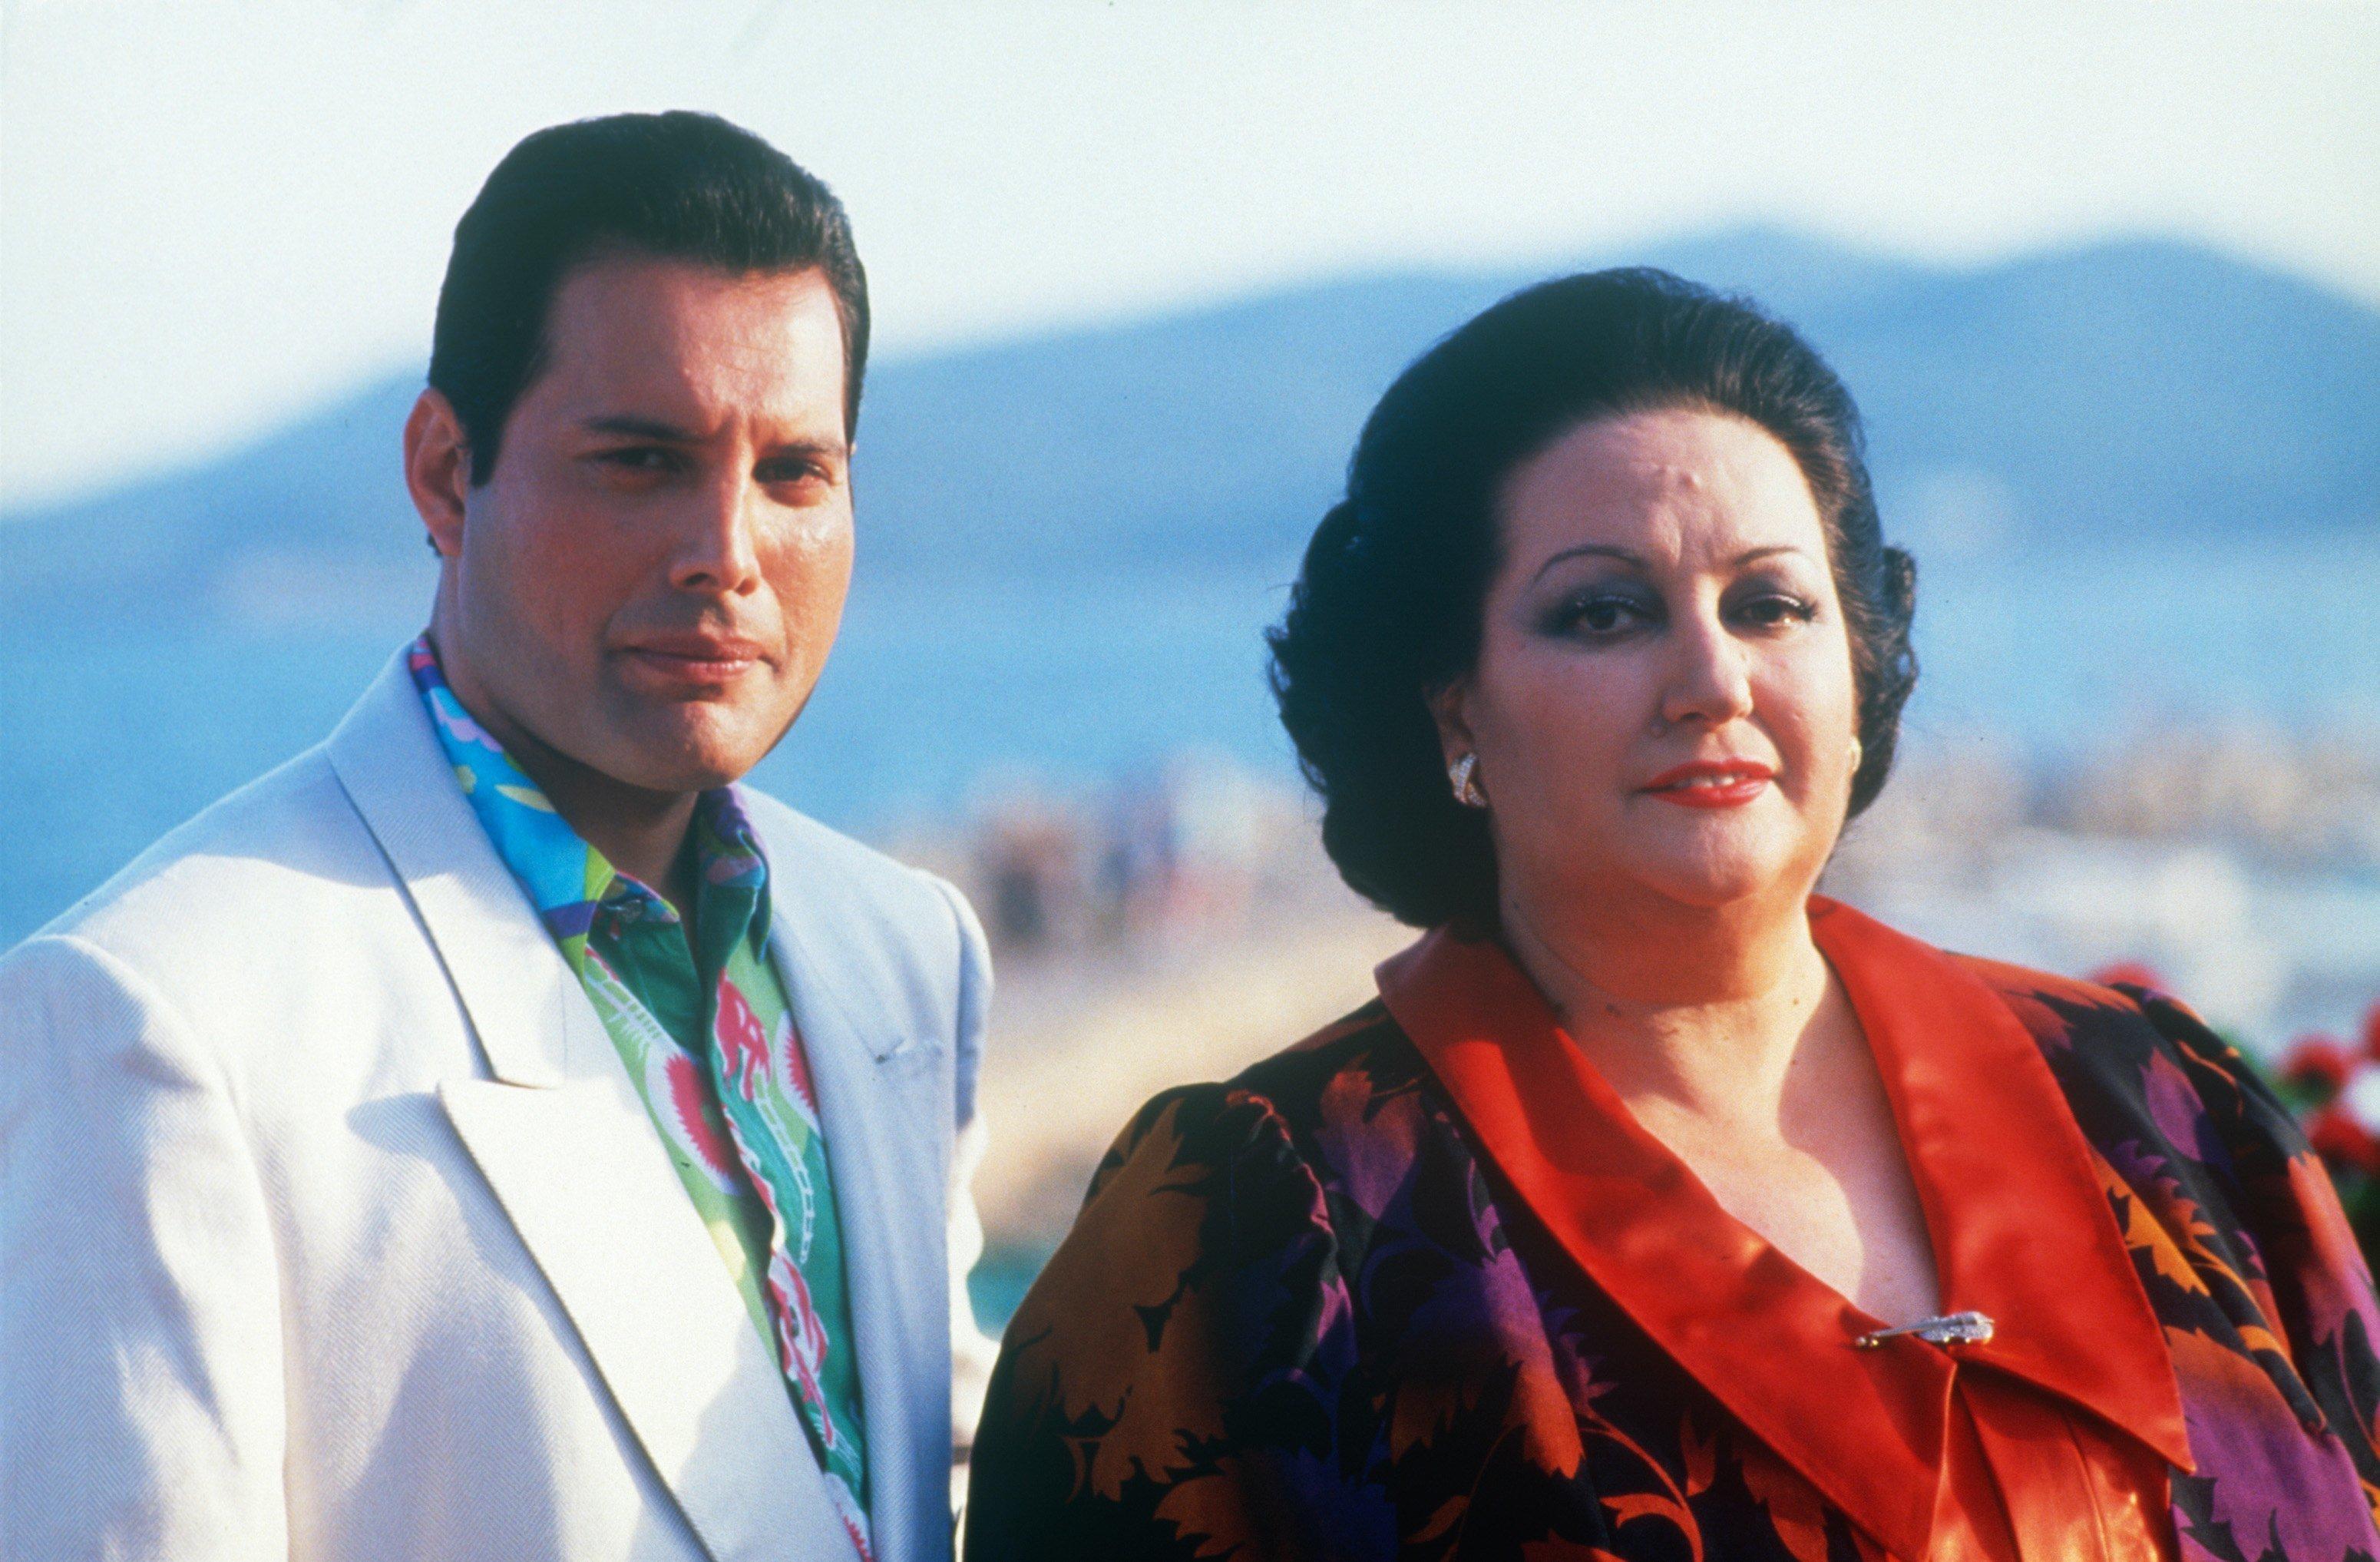 Spanish Opera Singer And Freddie Mercury Collaborator Montserrat Caballe Dies Aged